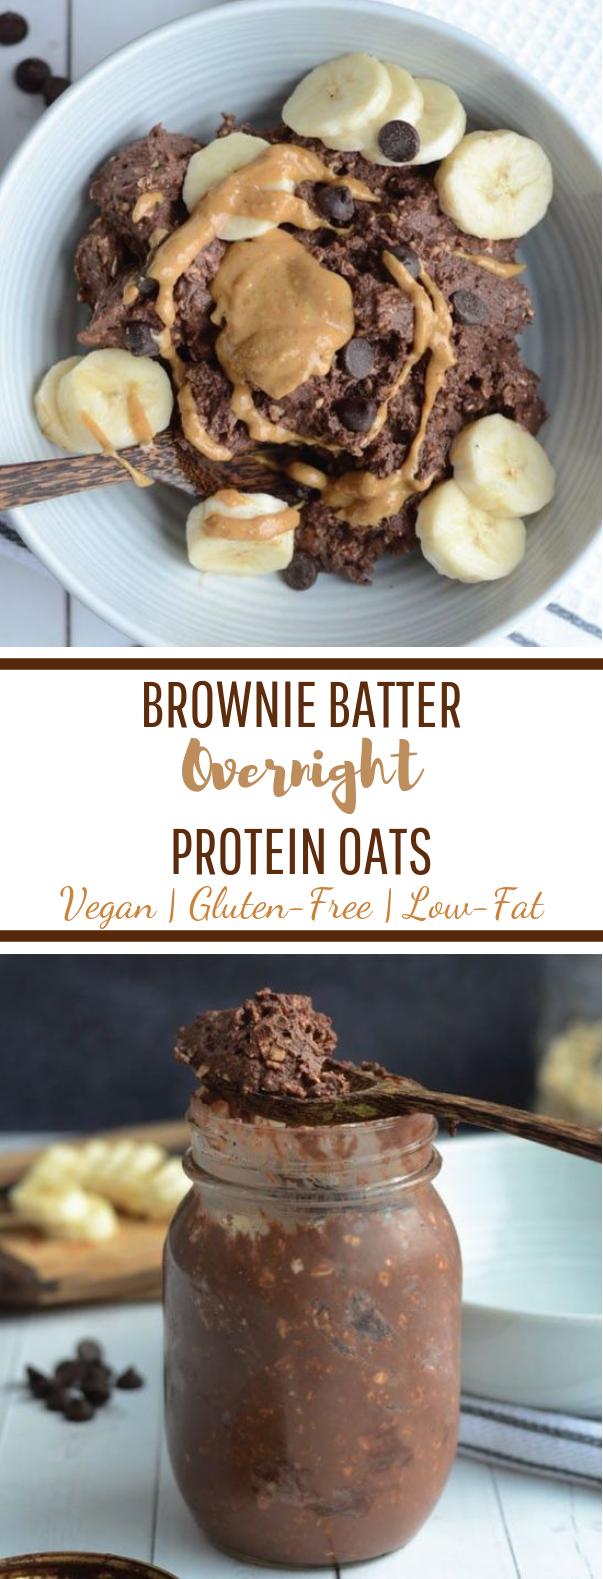 Brownie Batter Overnight Protein Oats #healthybreakfast #lowfat